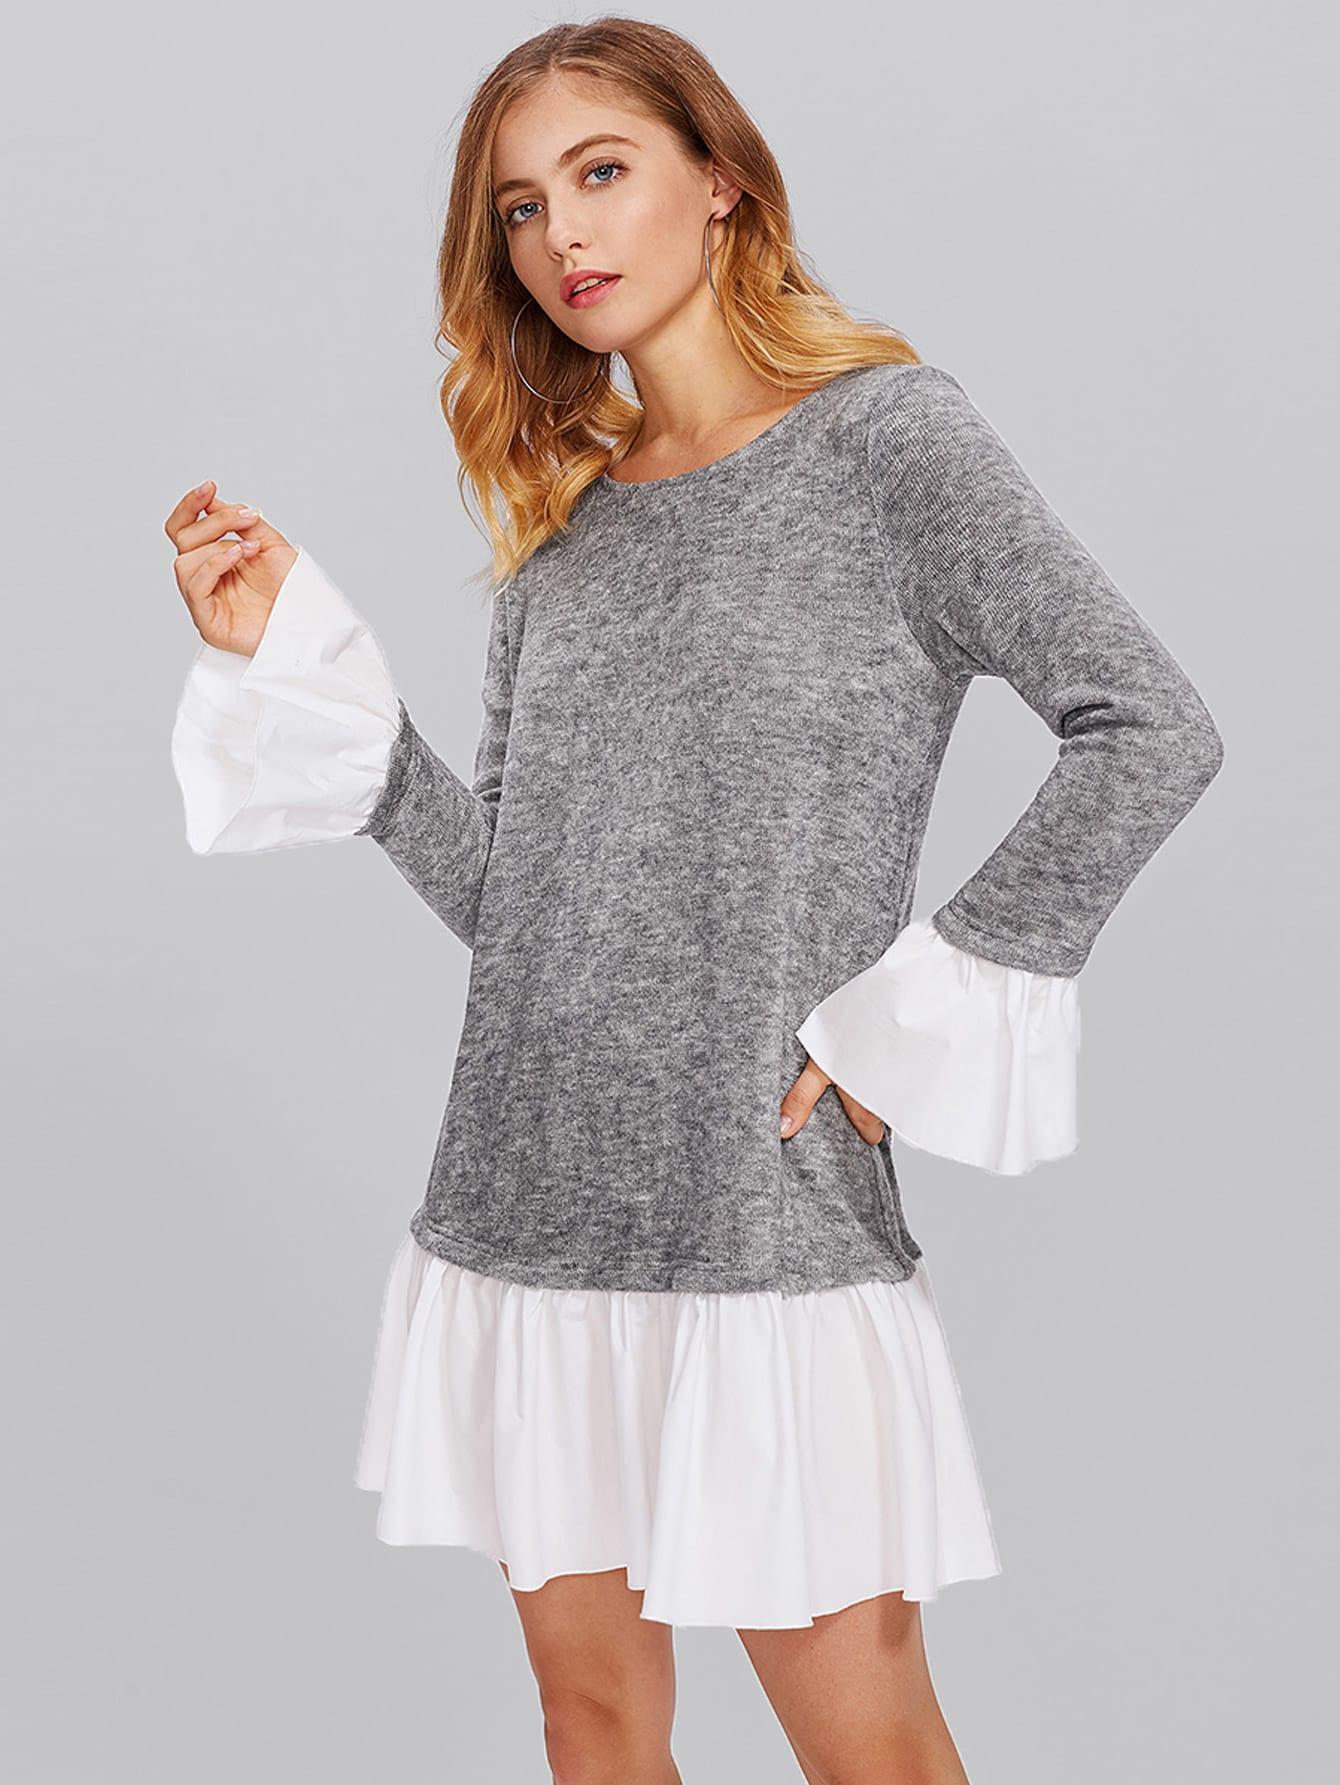 Contrast Ruffle Cuff And Hem Heather Knit Dress heather knit dolphin hem tee dress